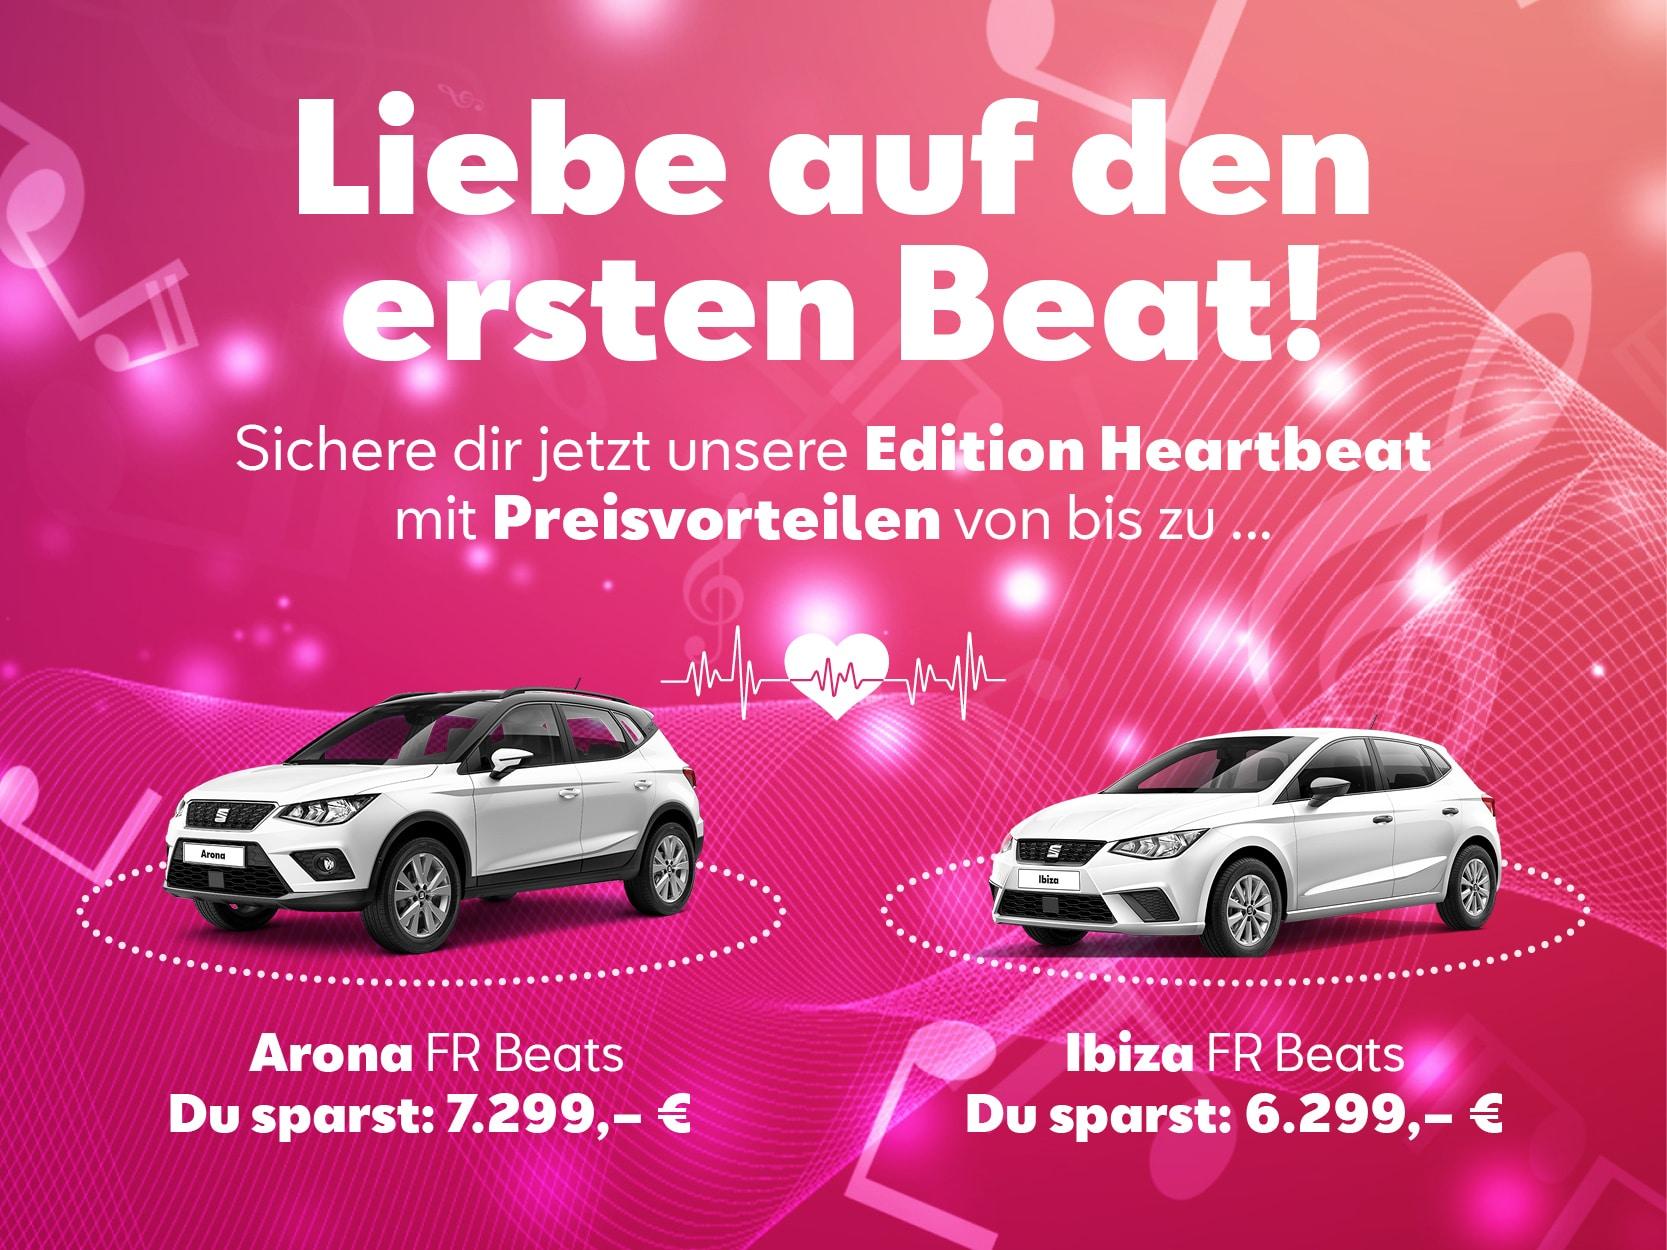 Edition Heartbeat